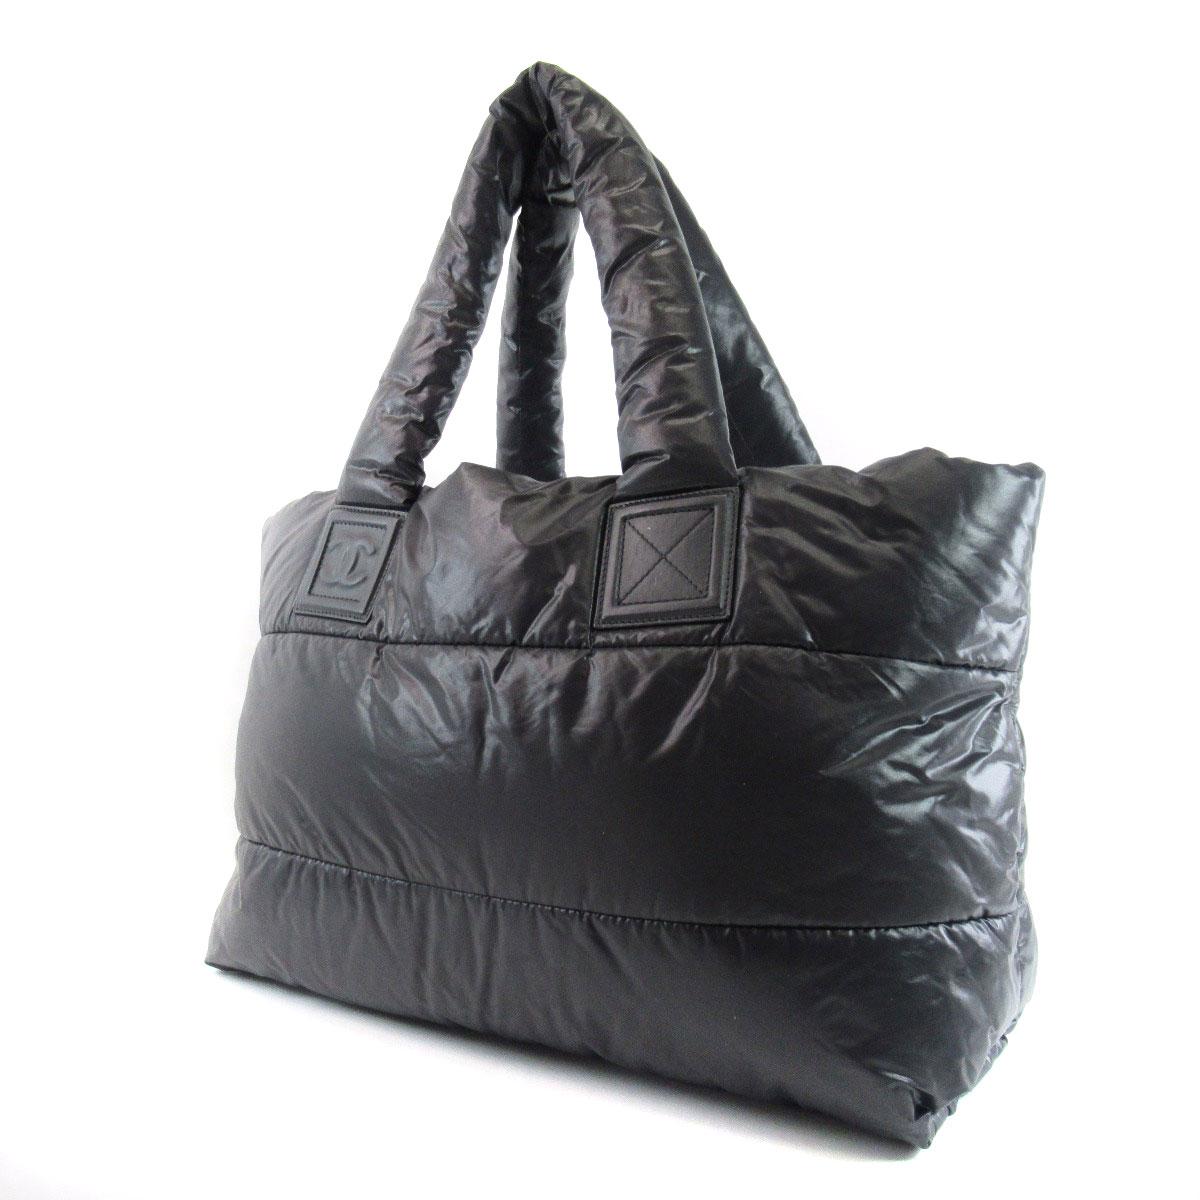 6fb4522b65fa Detalhes sobre CHANEL tote bag Coco Cocoon Nylon